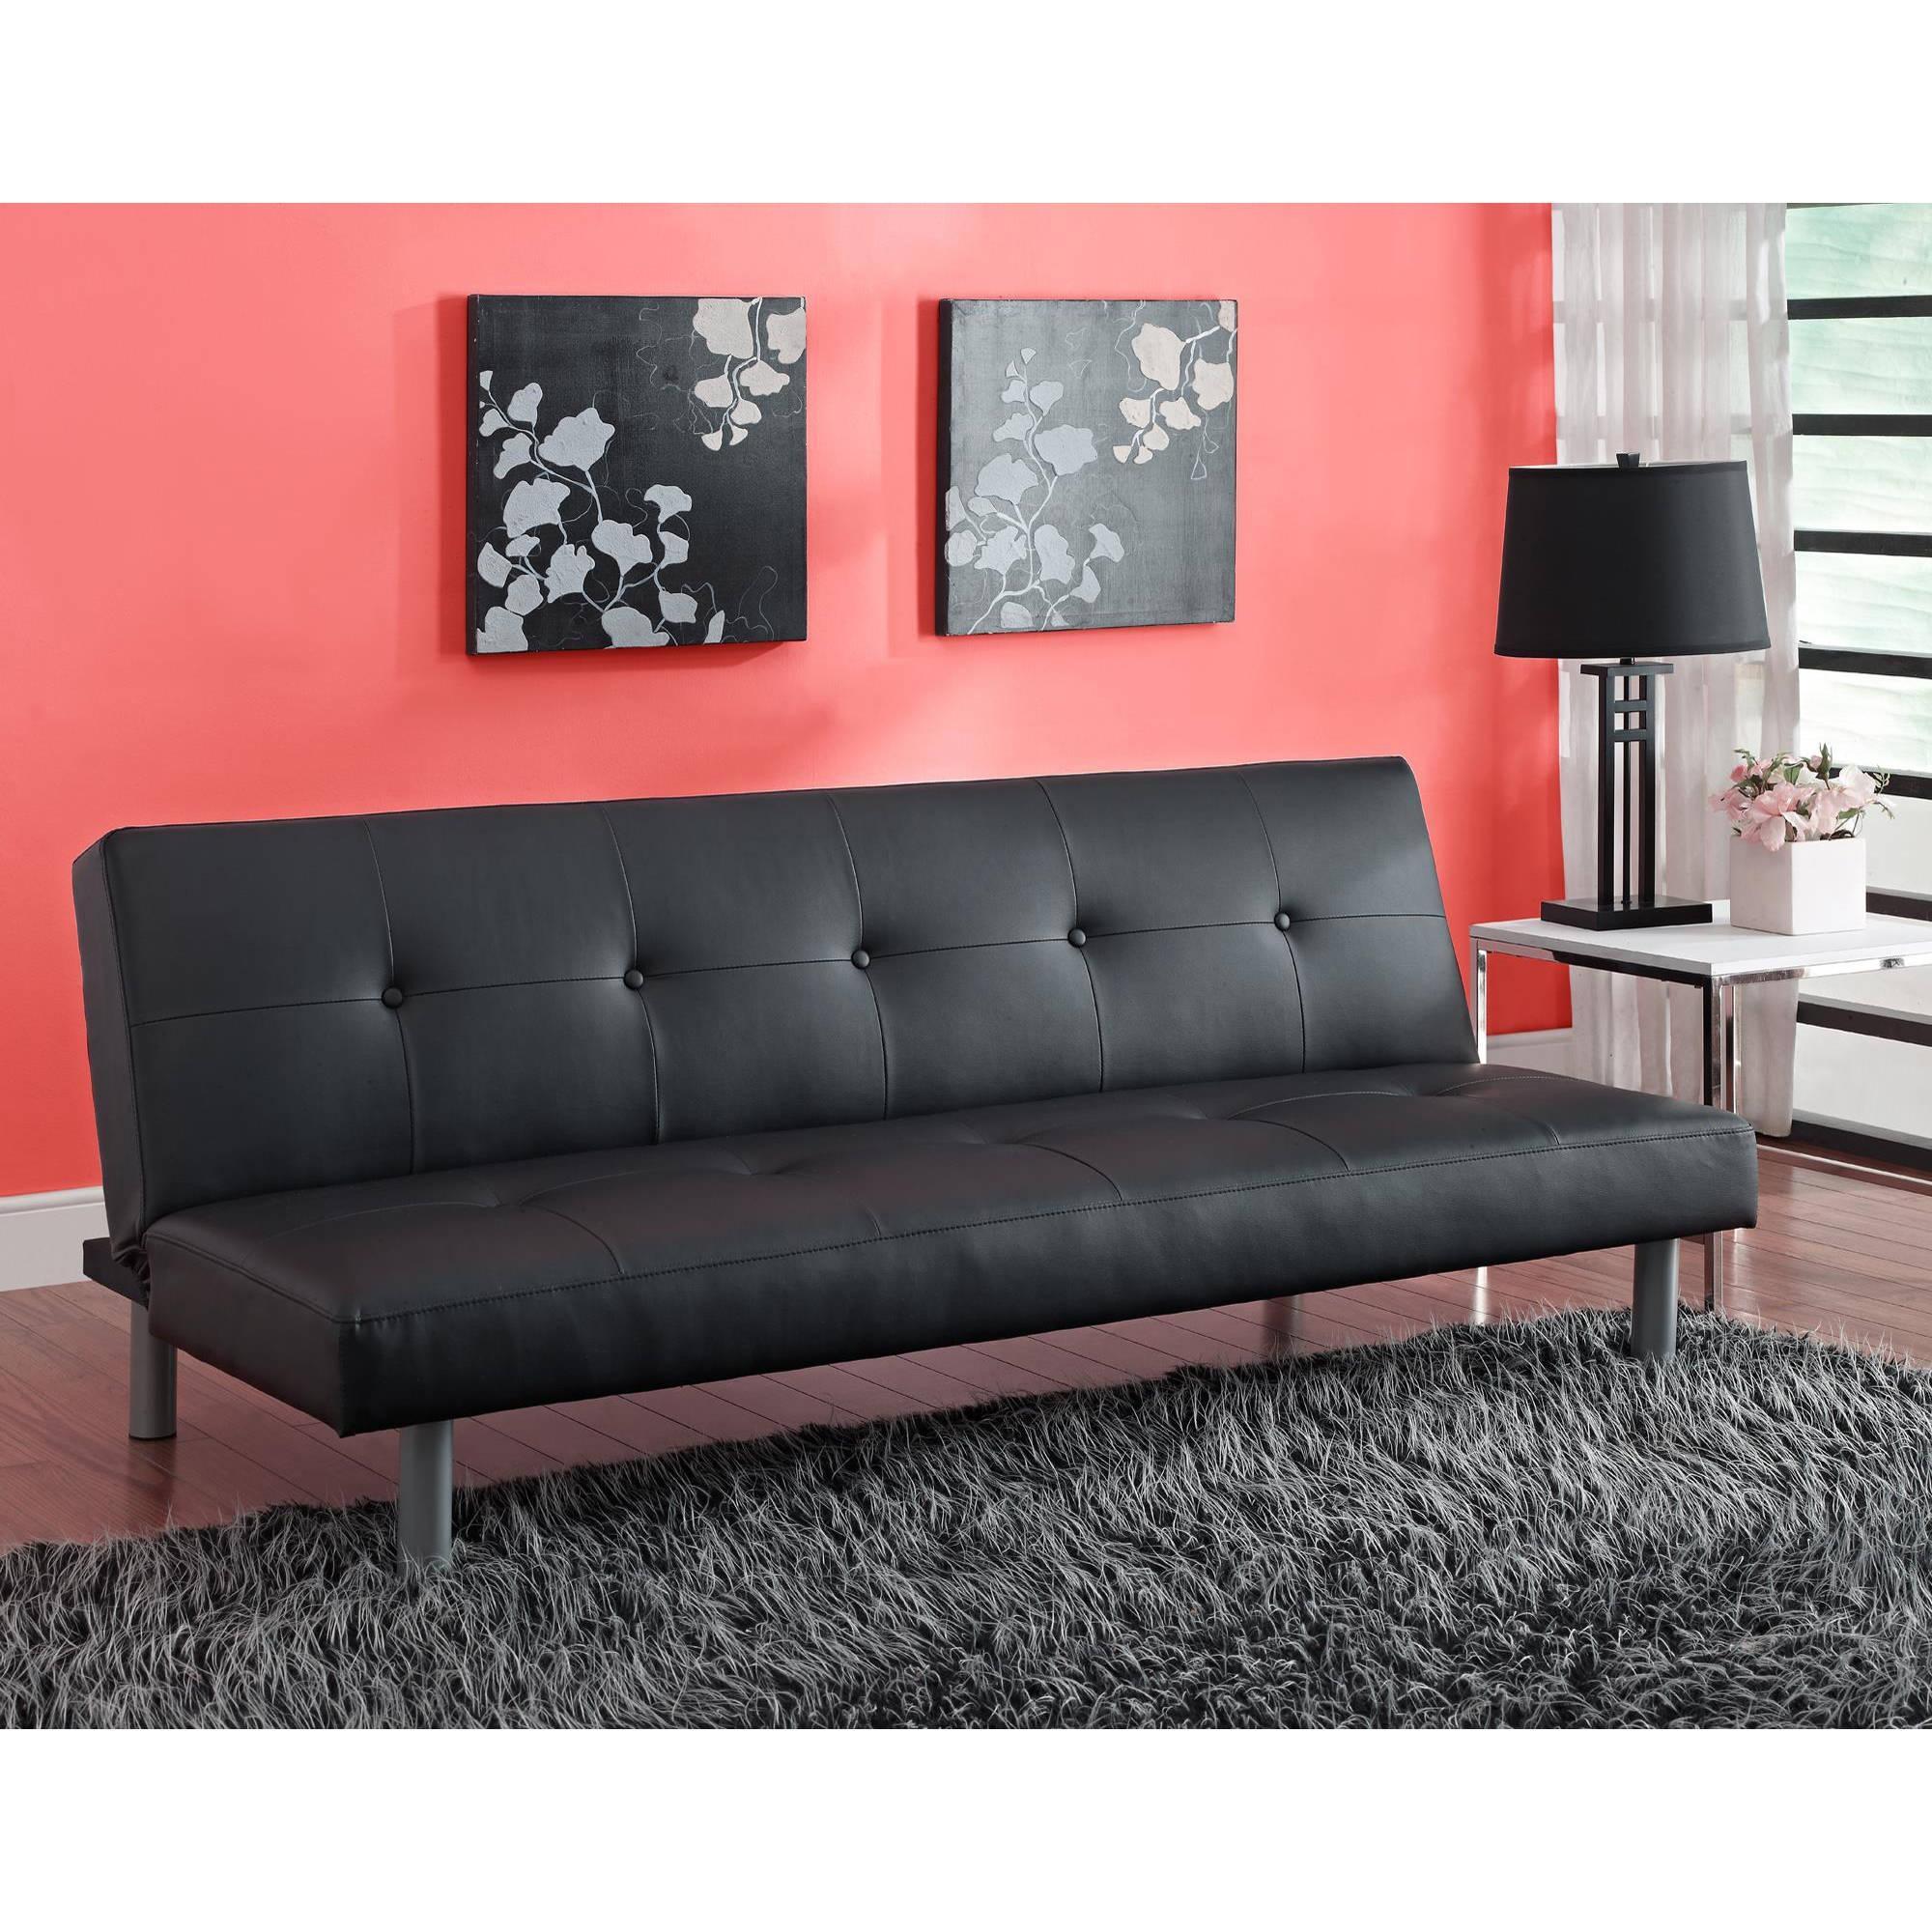 Furniture: Target Futons | Futon Beds Walmart | Couch Bed Walmart Pertaining To Target Couch Beds (View 11 of 20)